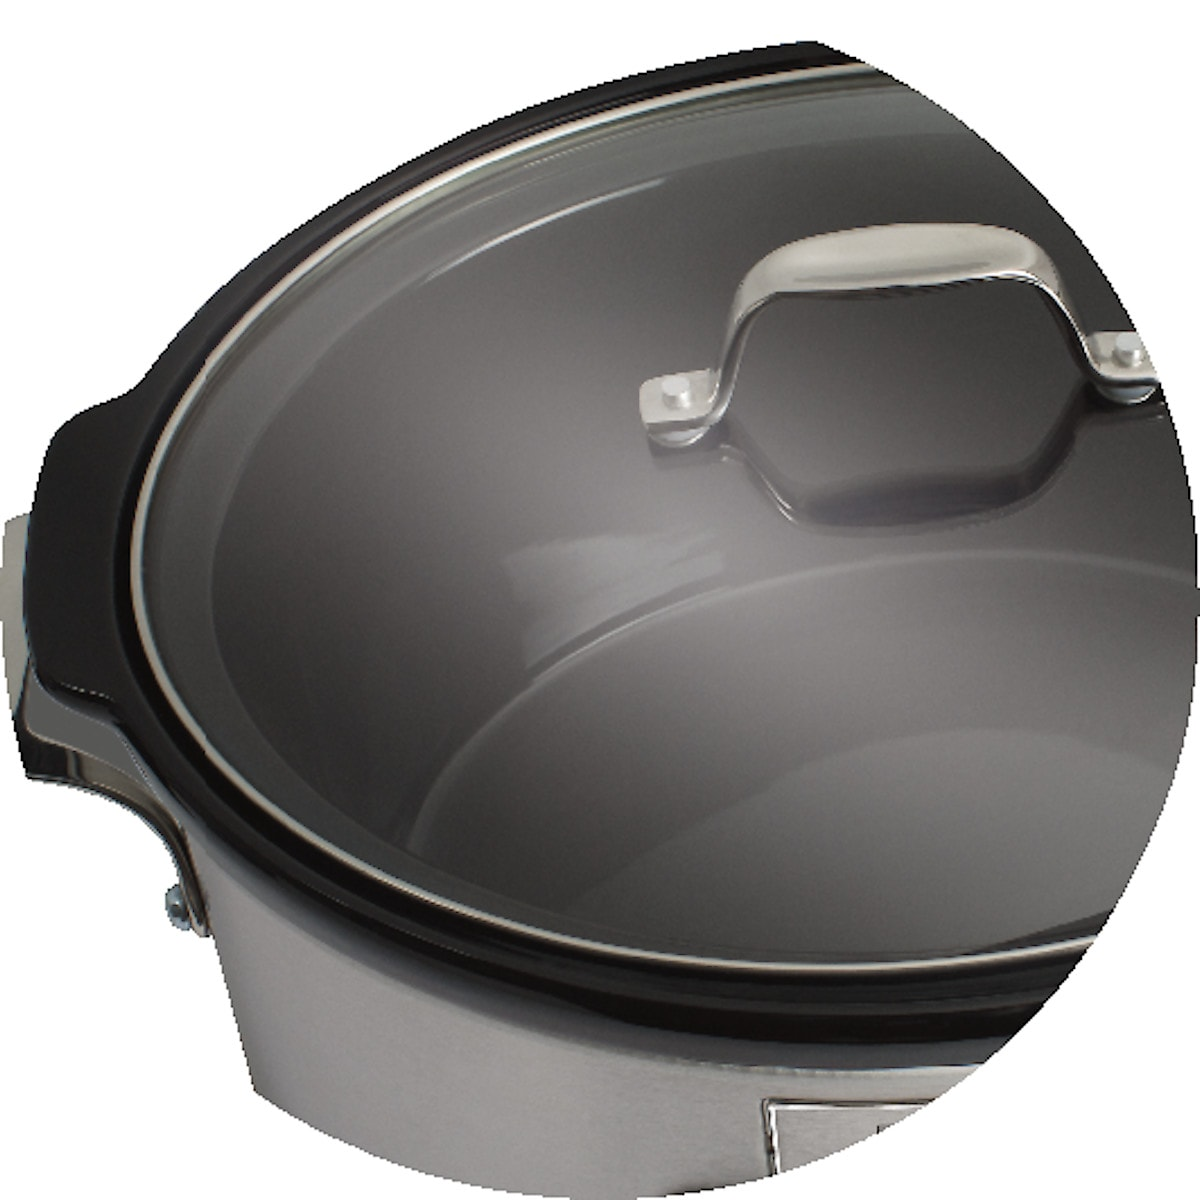 Electrolux ESC7400 Slow cooker, 6,8 l